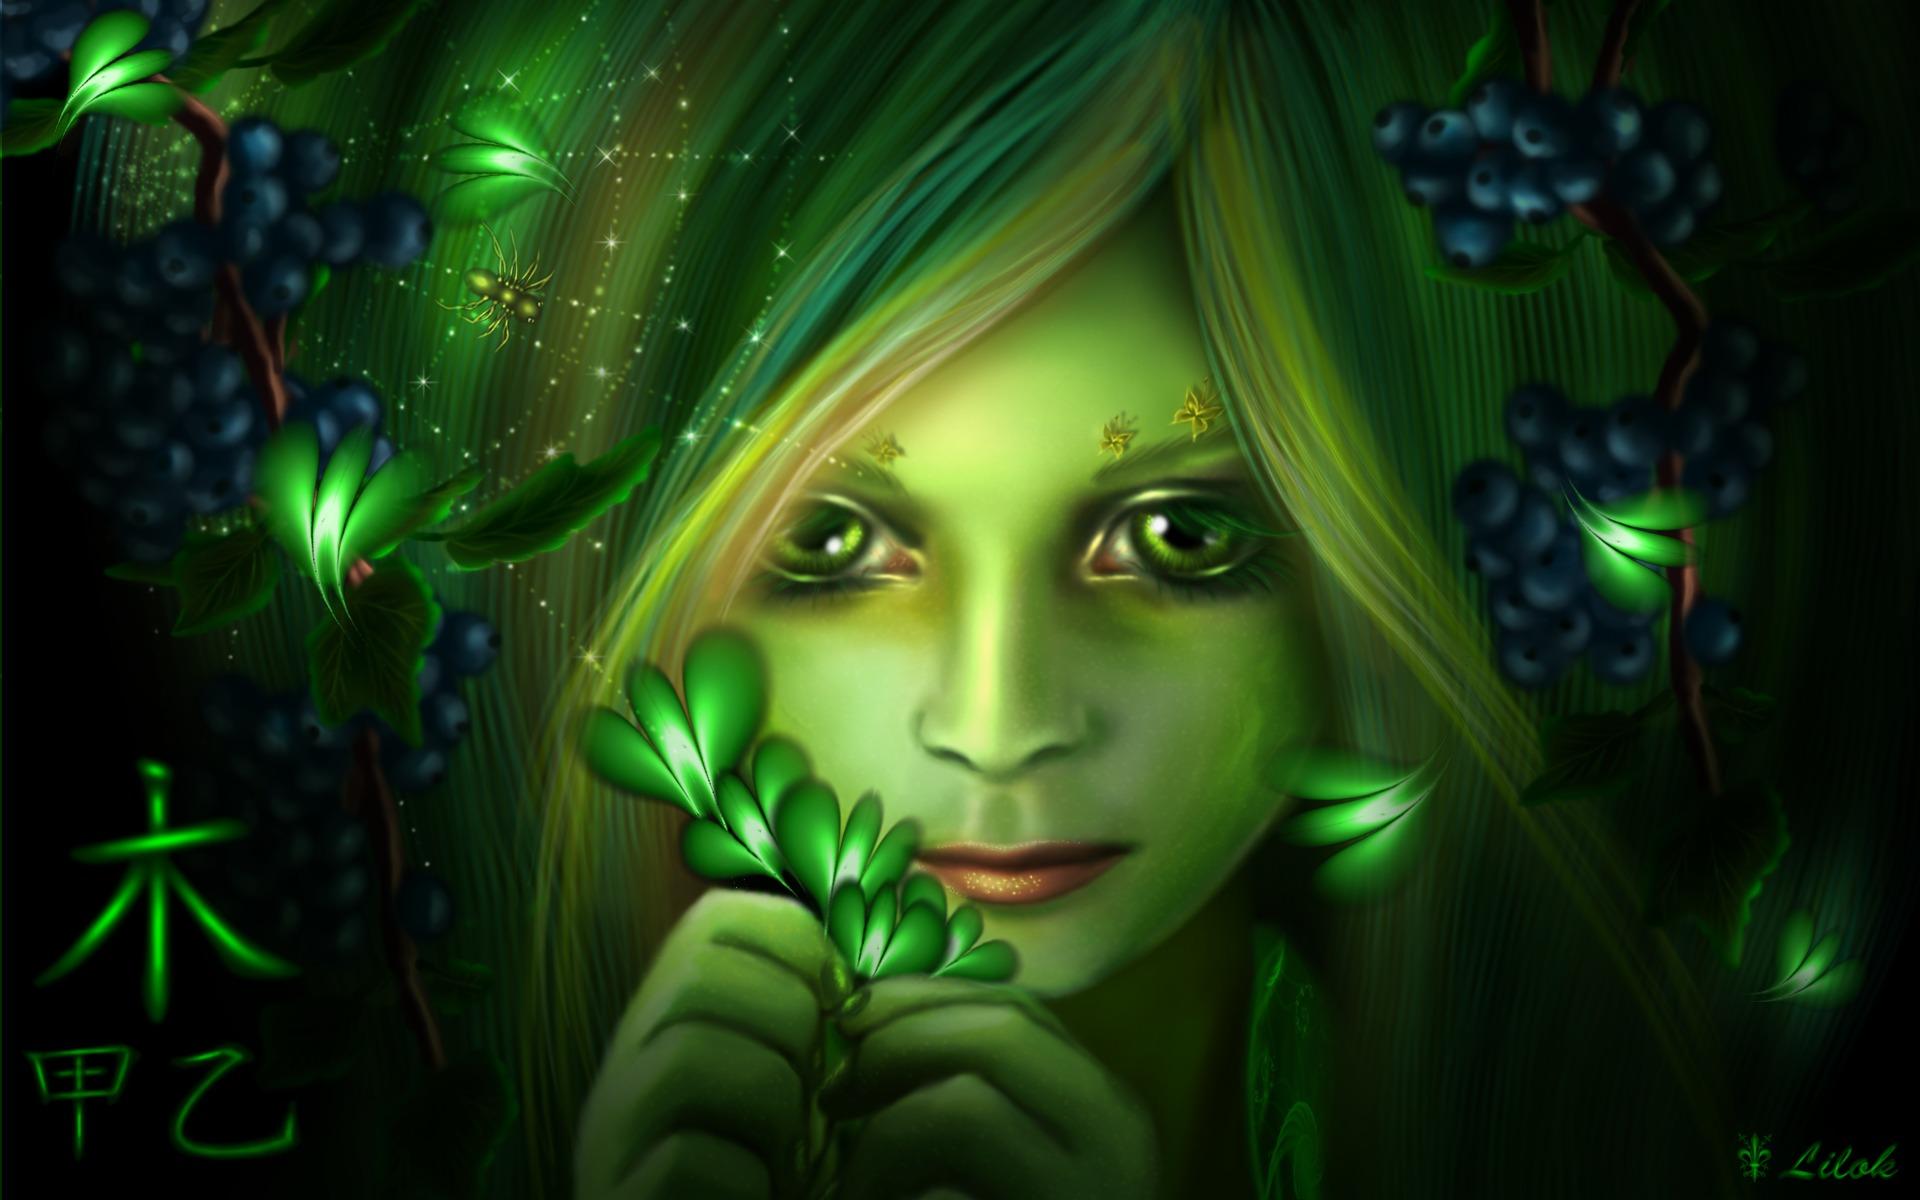 Велосипедиста для, картинки фэнтези девушки бабочки взгляд